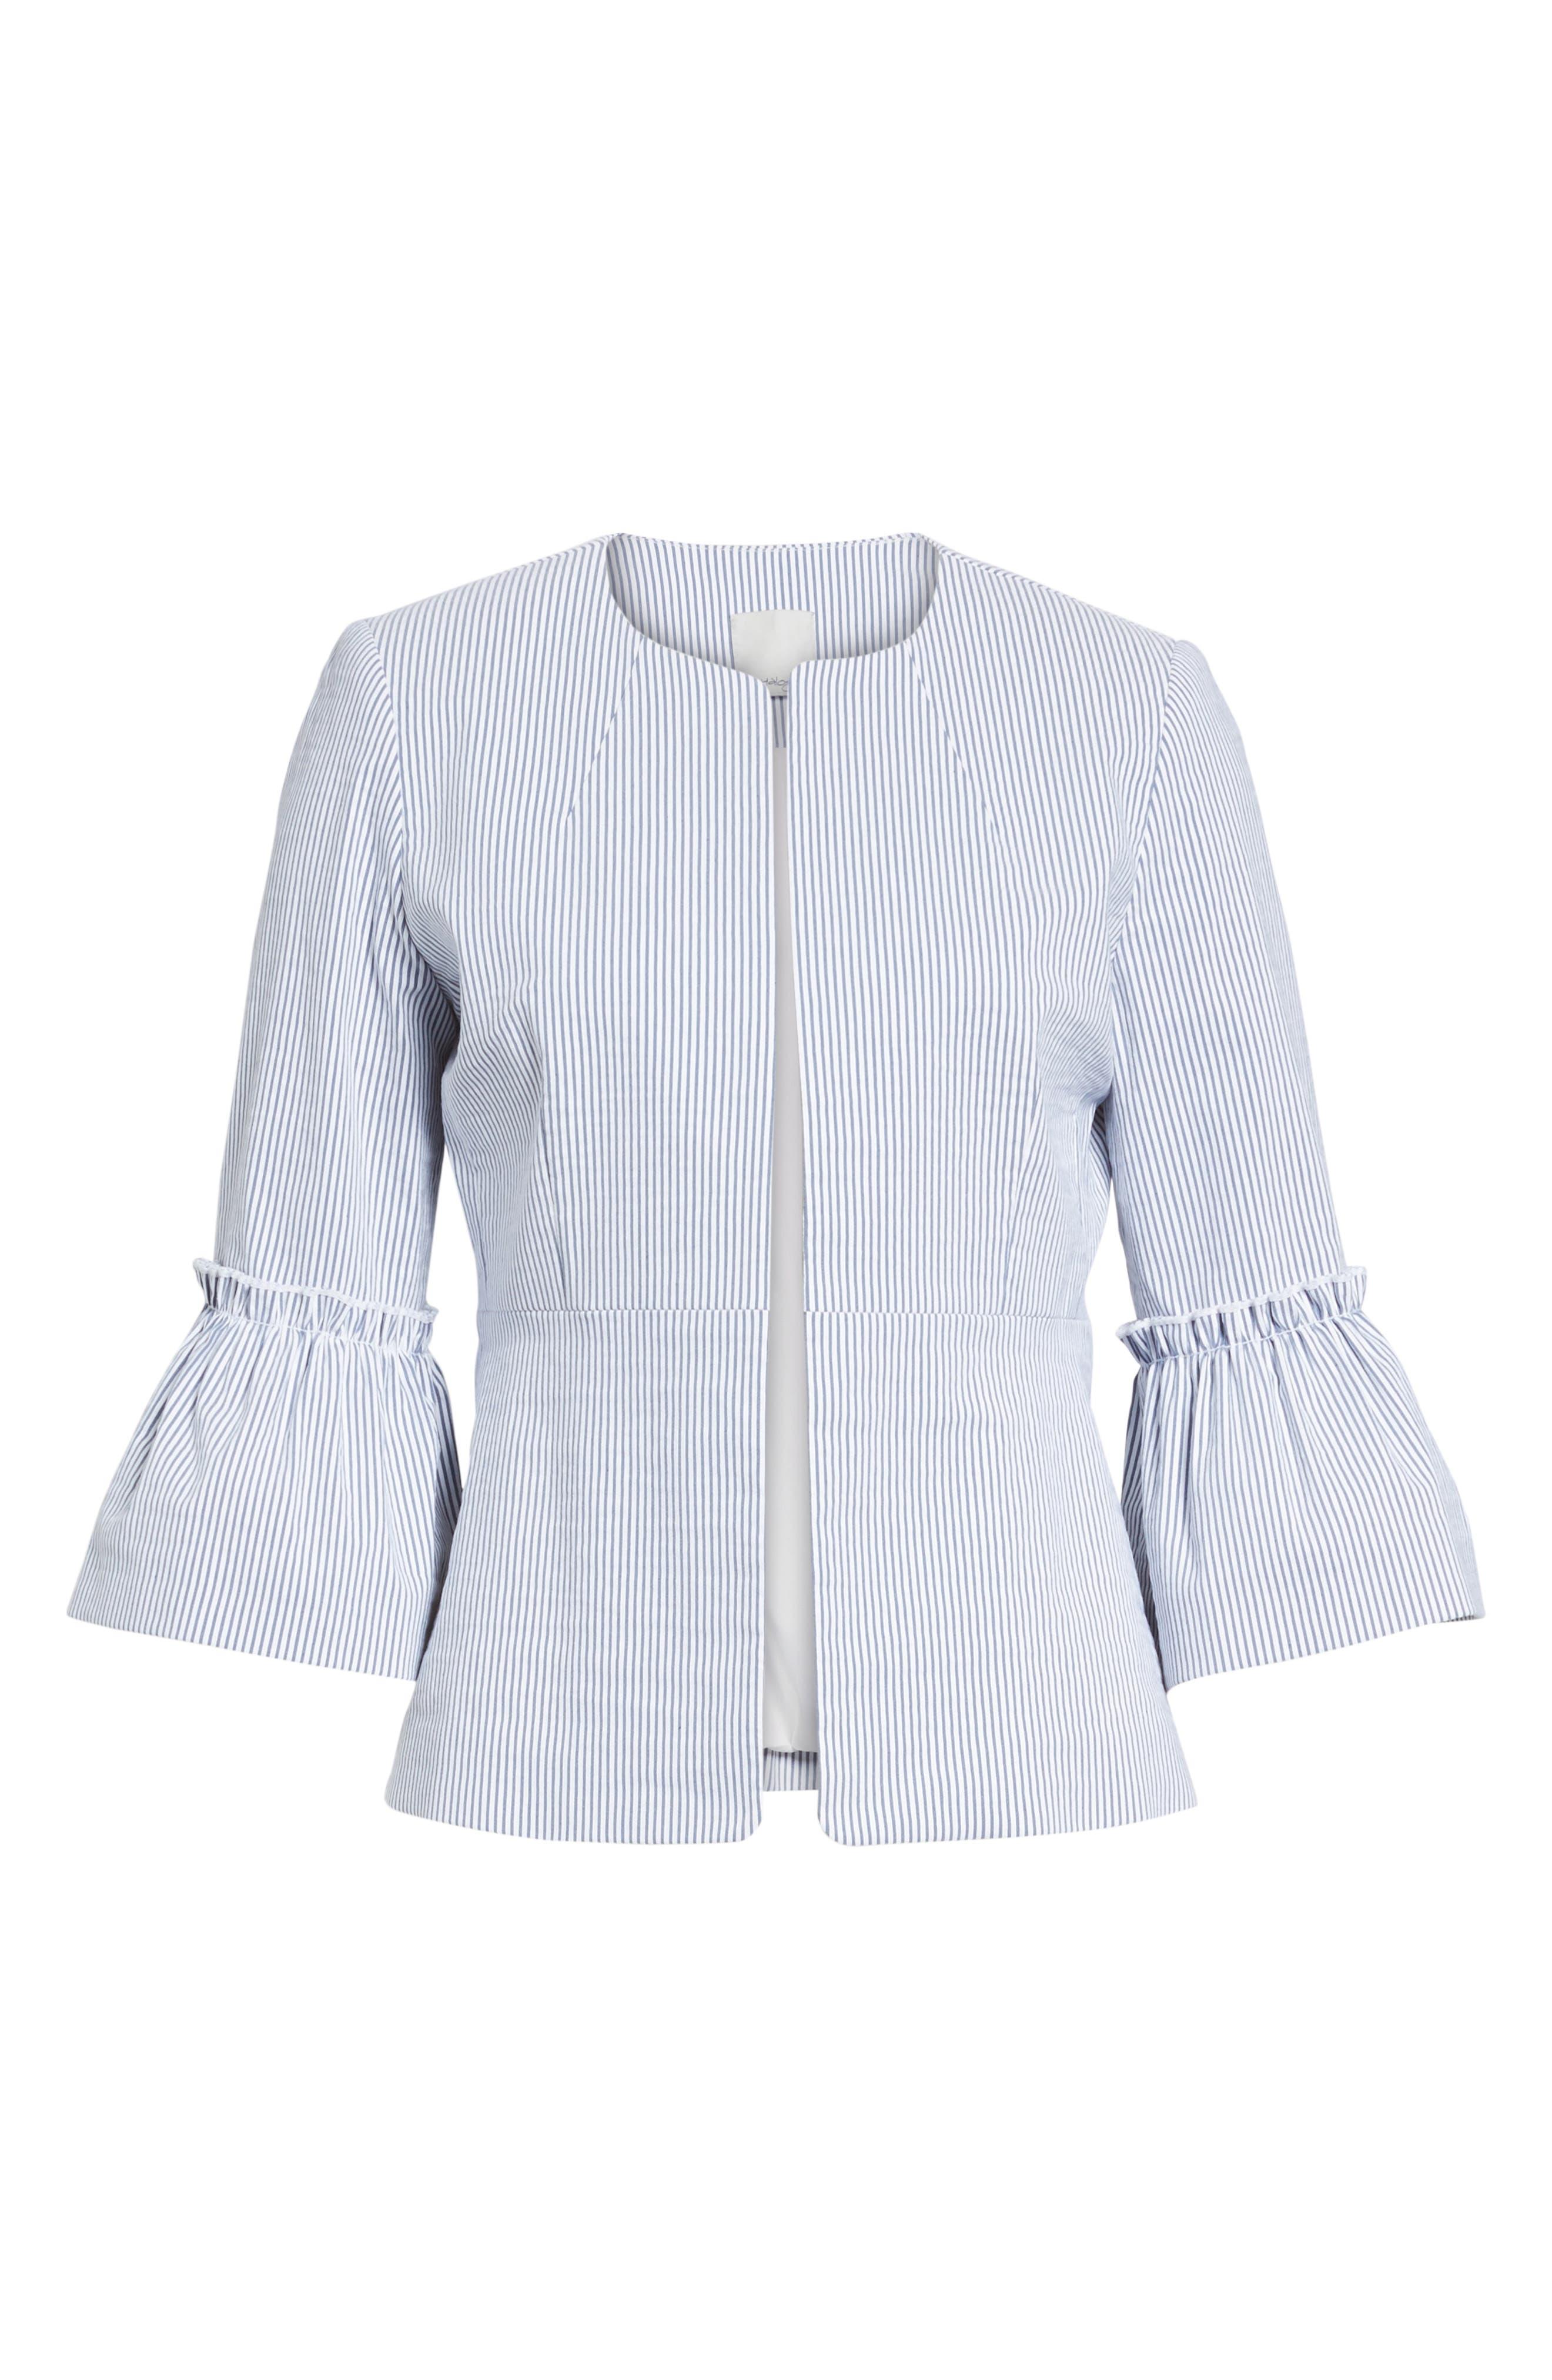 Ruffle Sleeve Open Jacket,                             Alternate thumbnail 6, color,                             Blue- White Seersucker